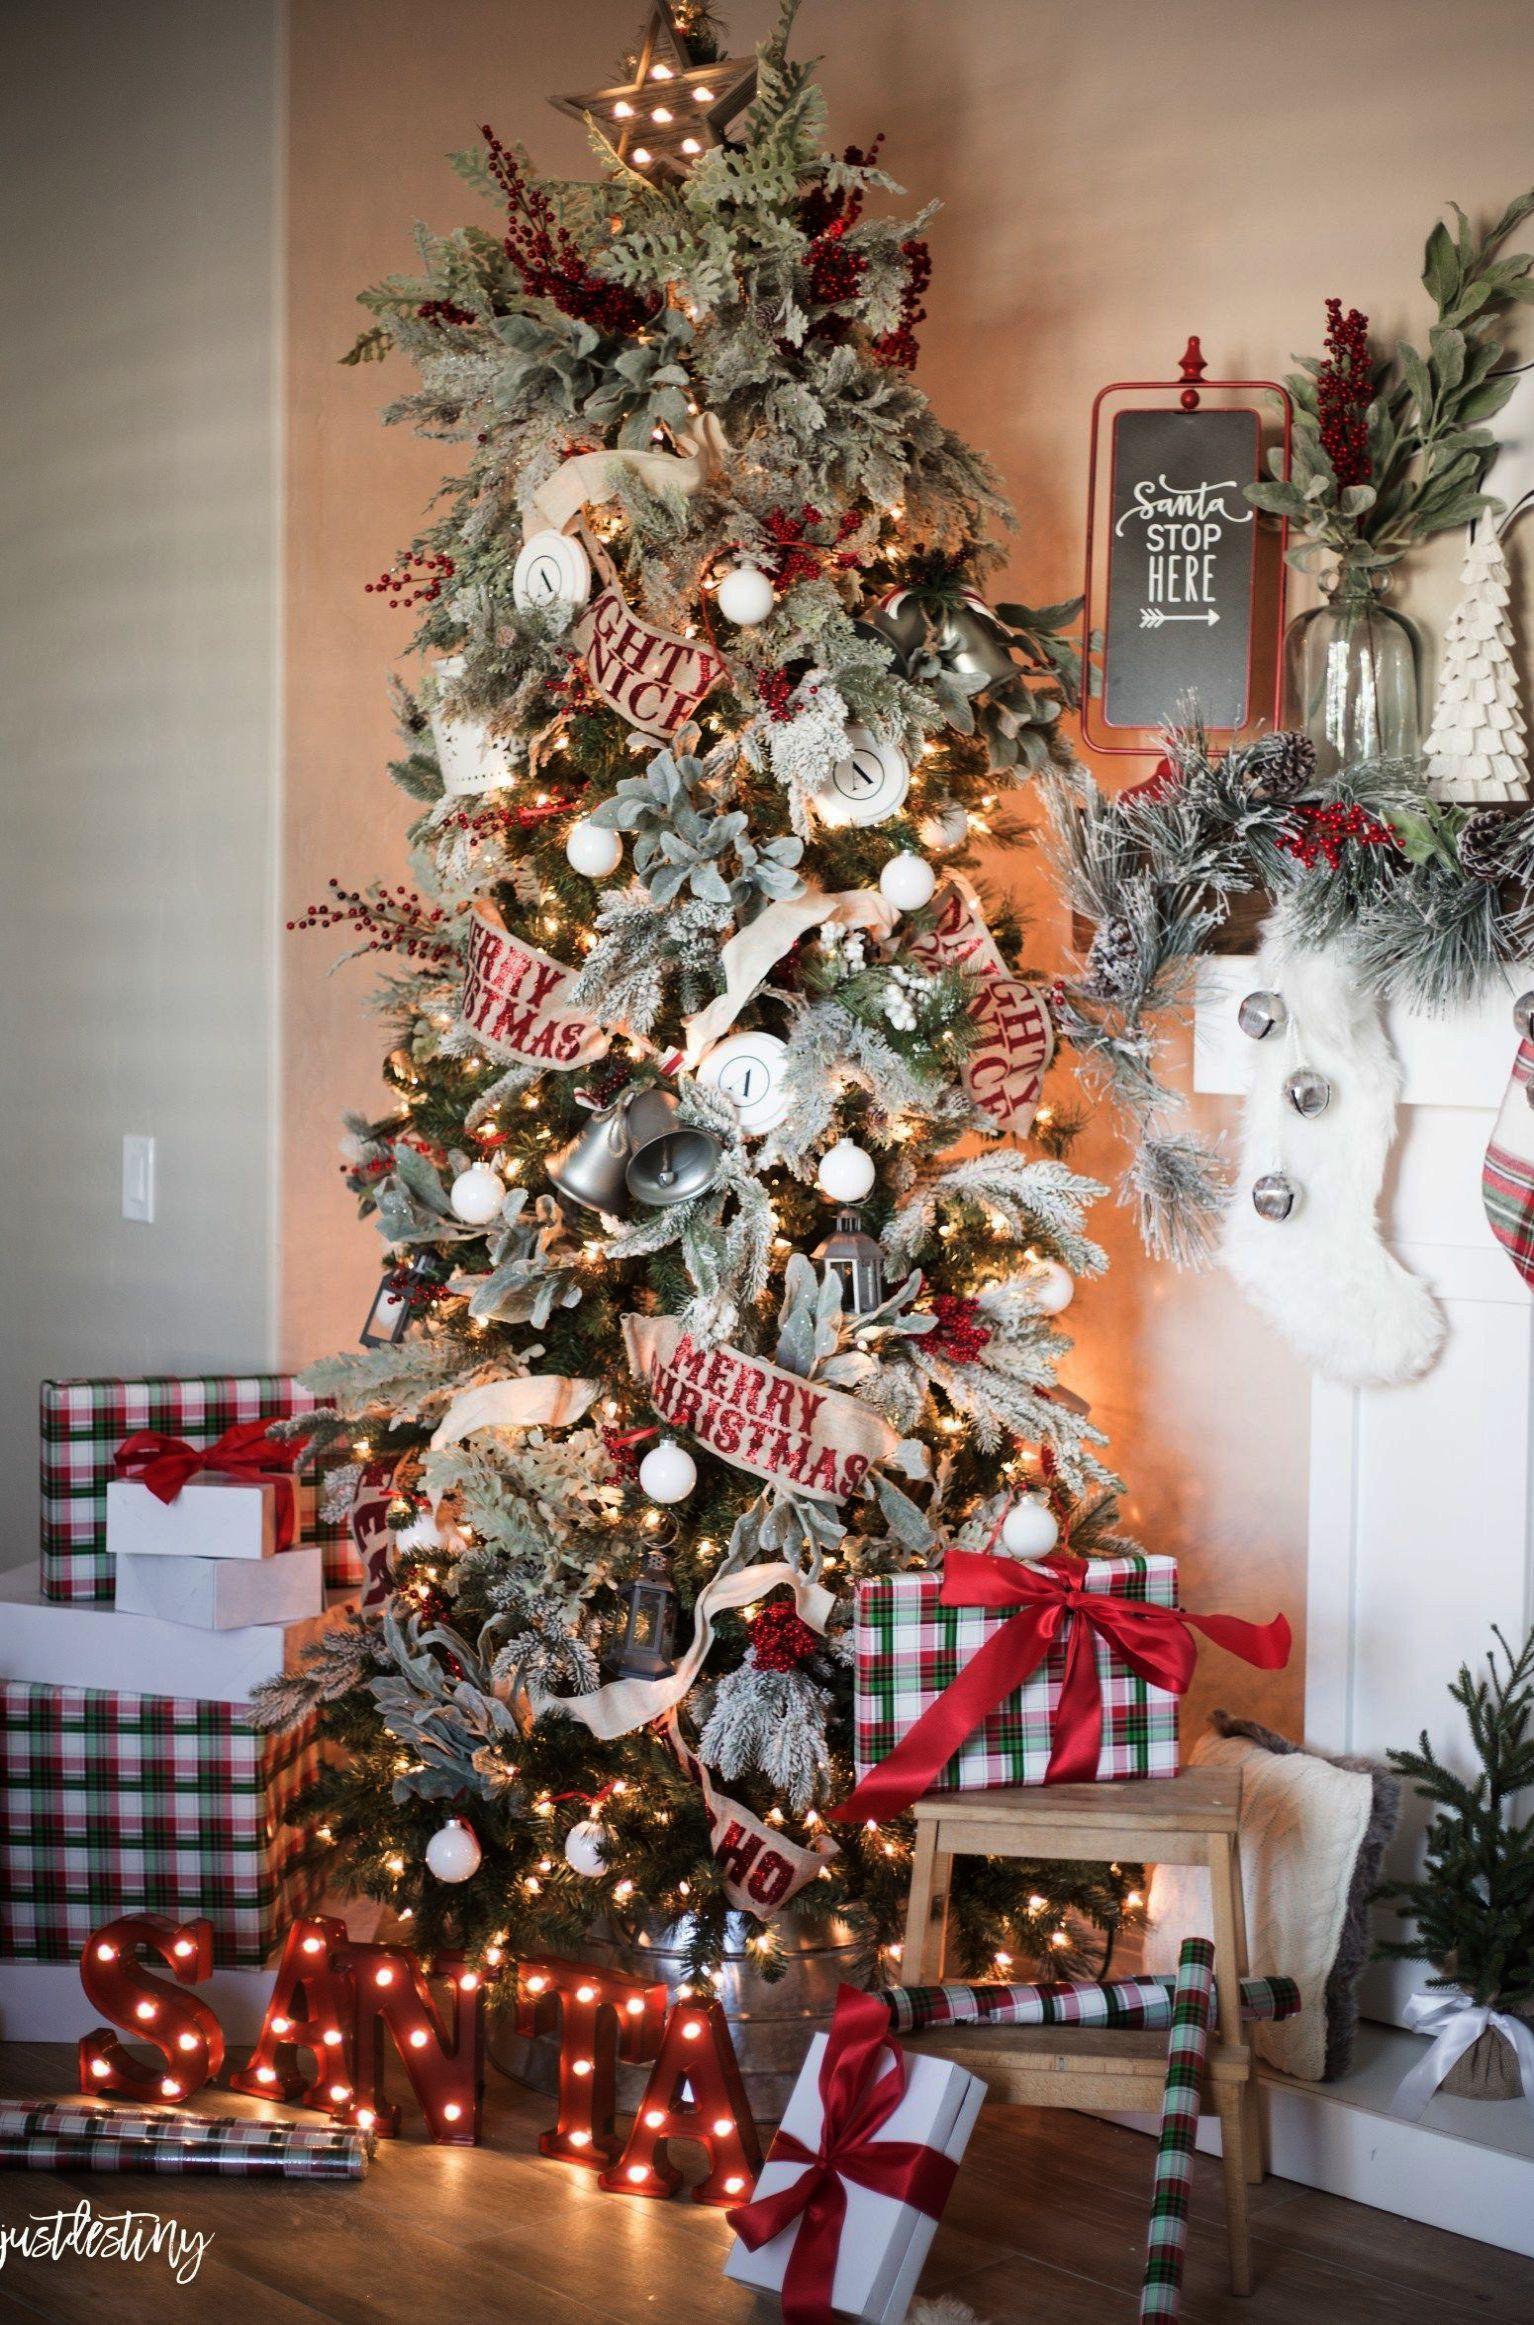 Michaels Christmas Trees 9 Ft Christmas Tree Storage Box Menards Order Christmas Tree S Classic Christmas Tree Michaels Christmas Trees Pretty Christmas Trees